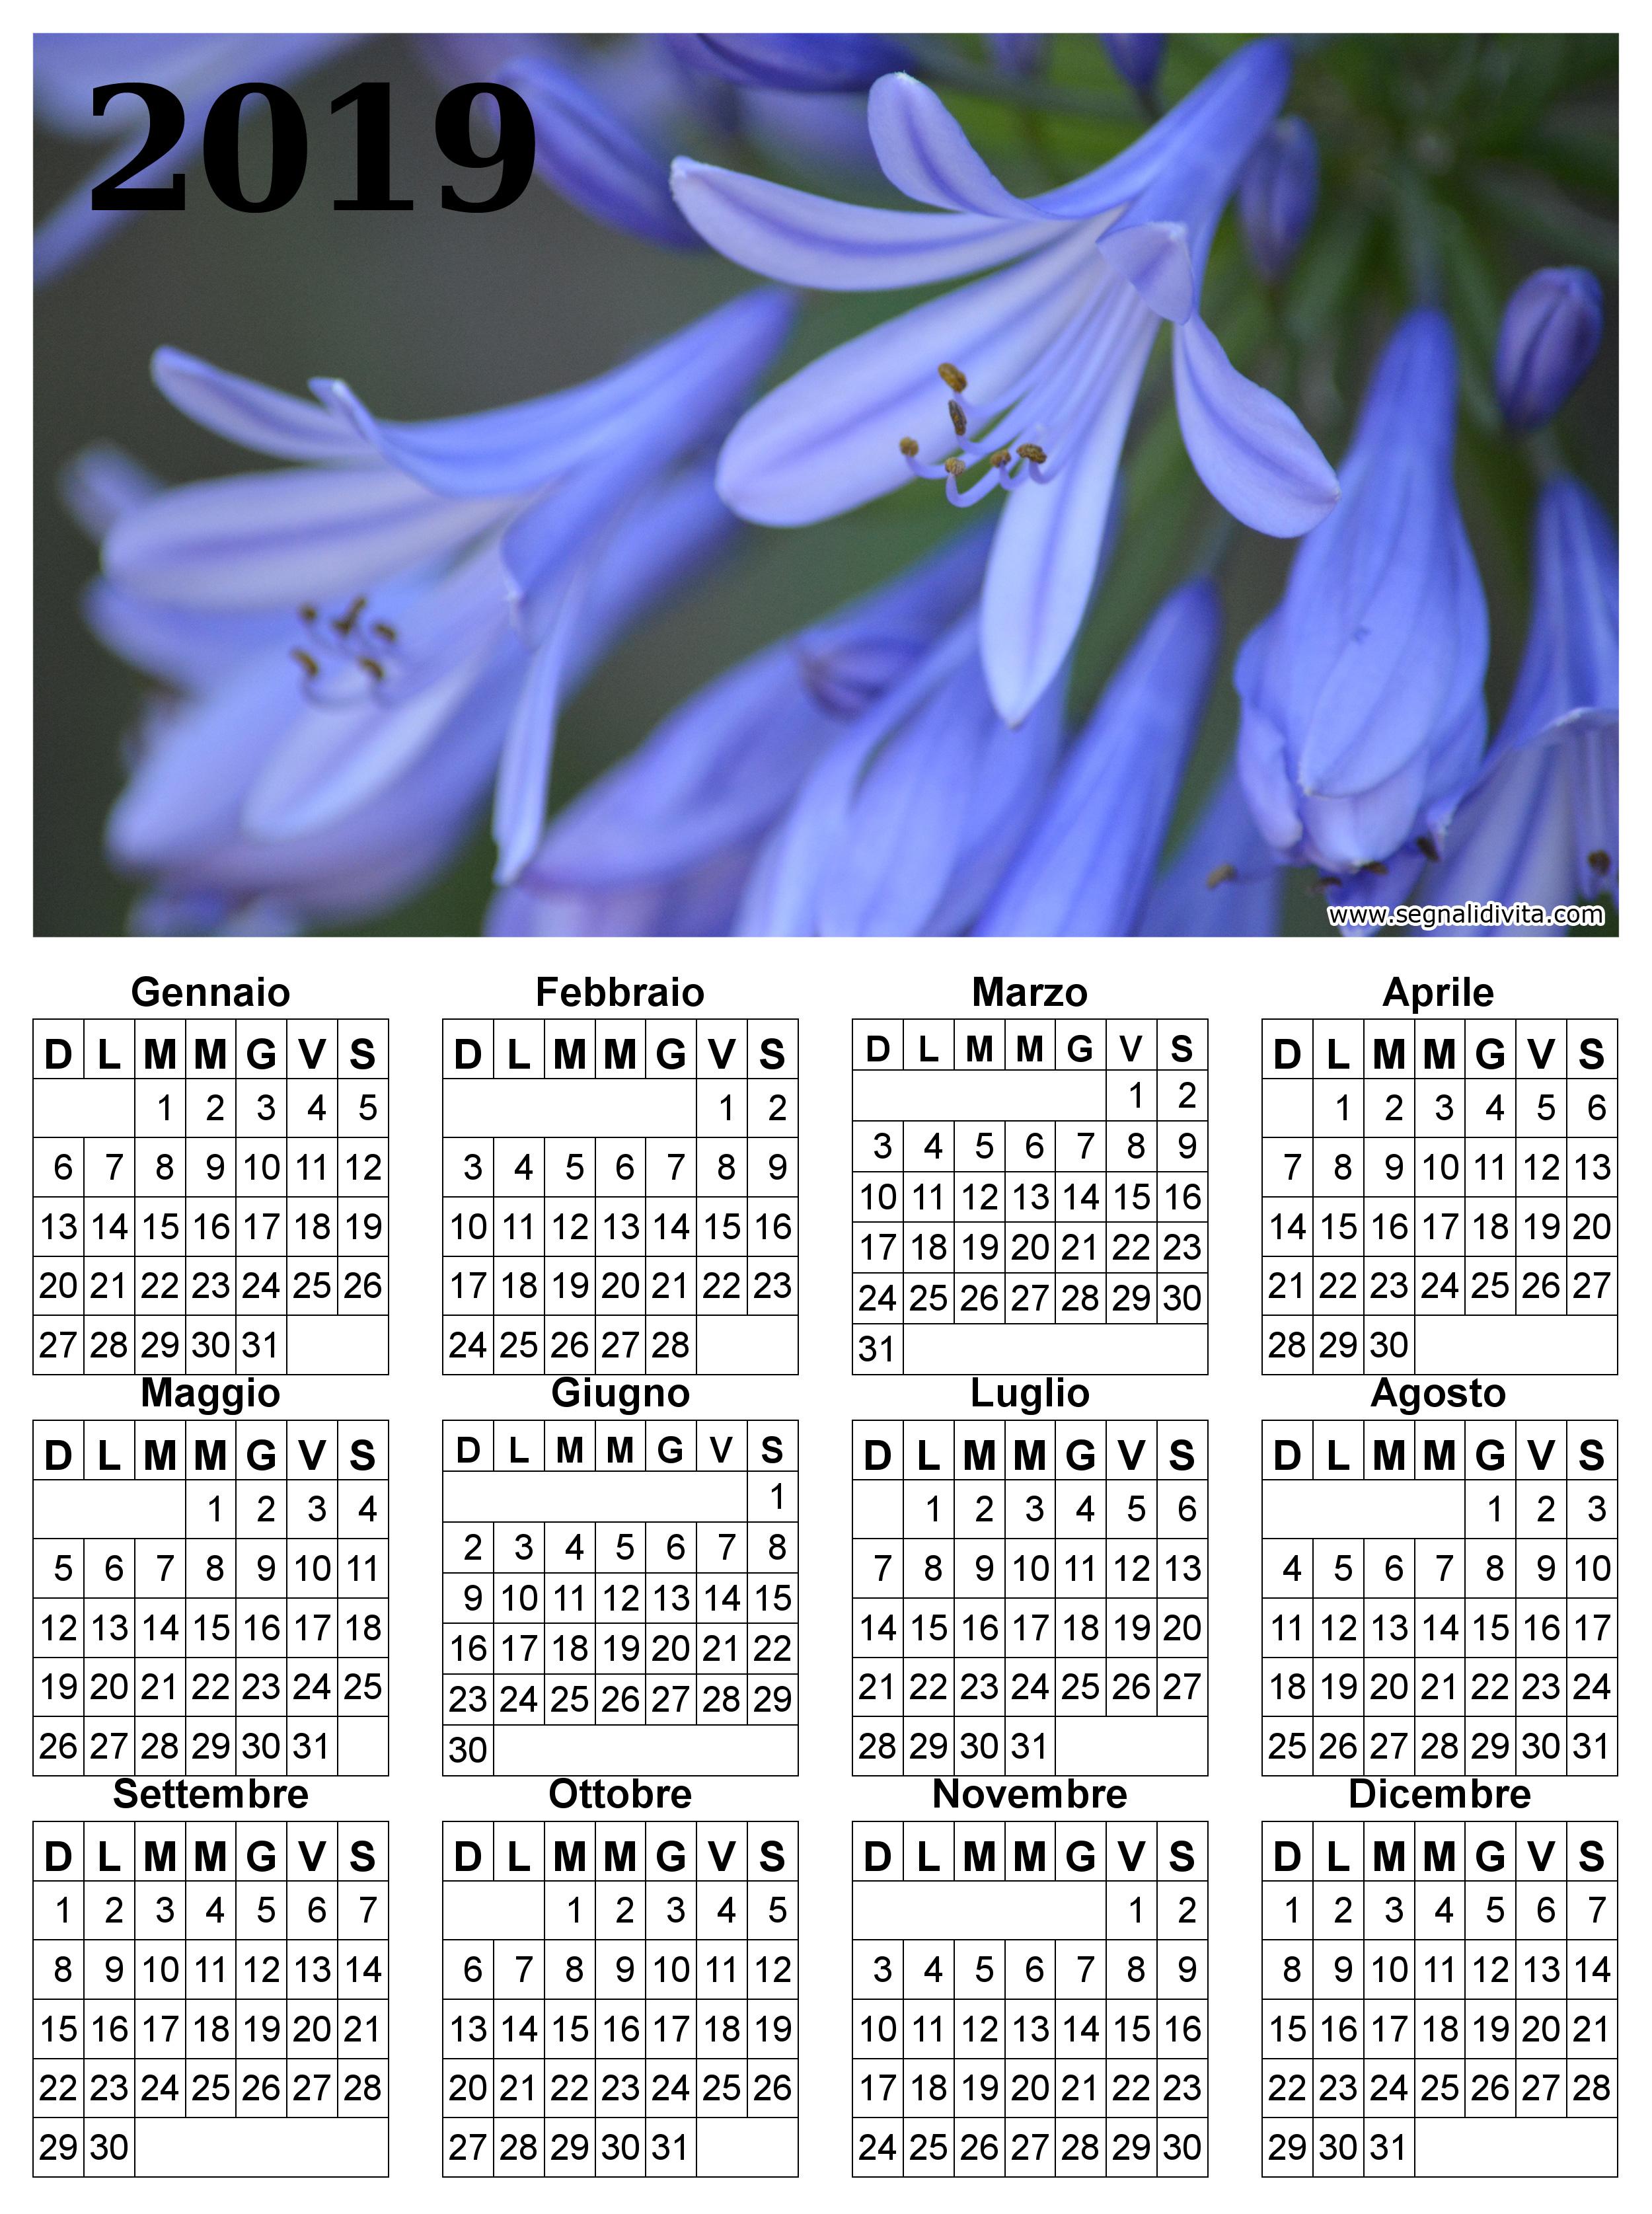 Calendario fiori del 2019